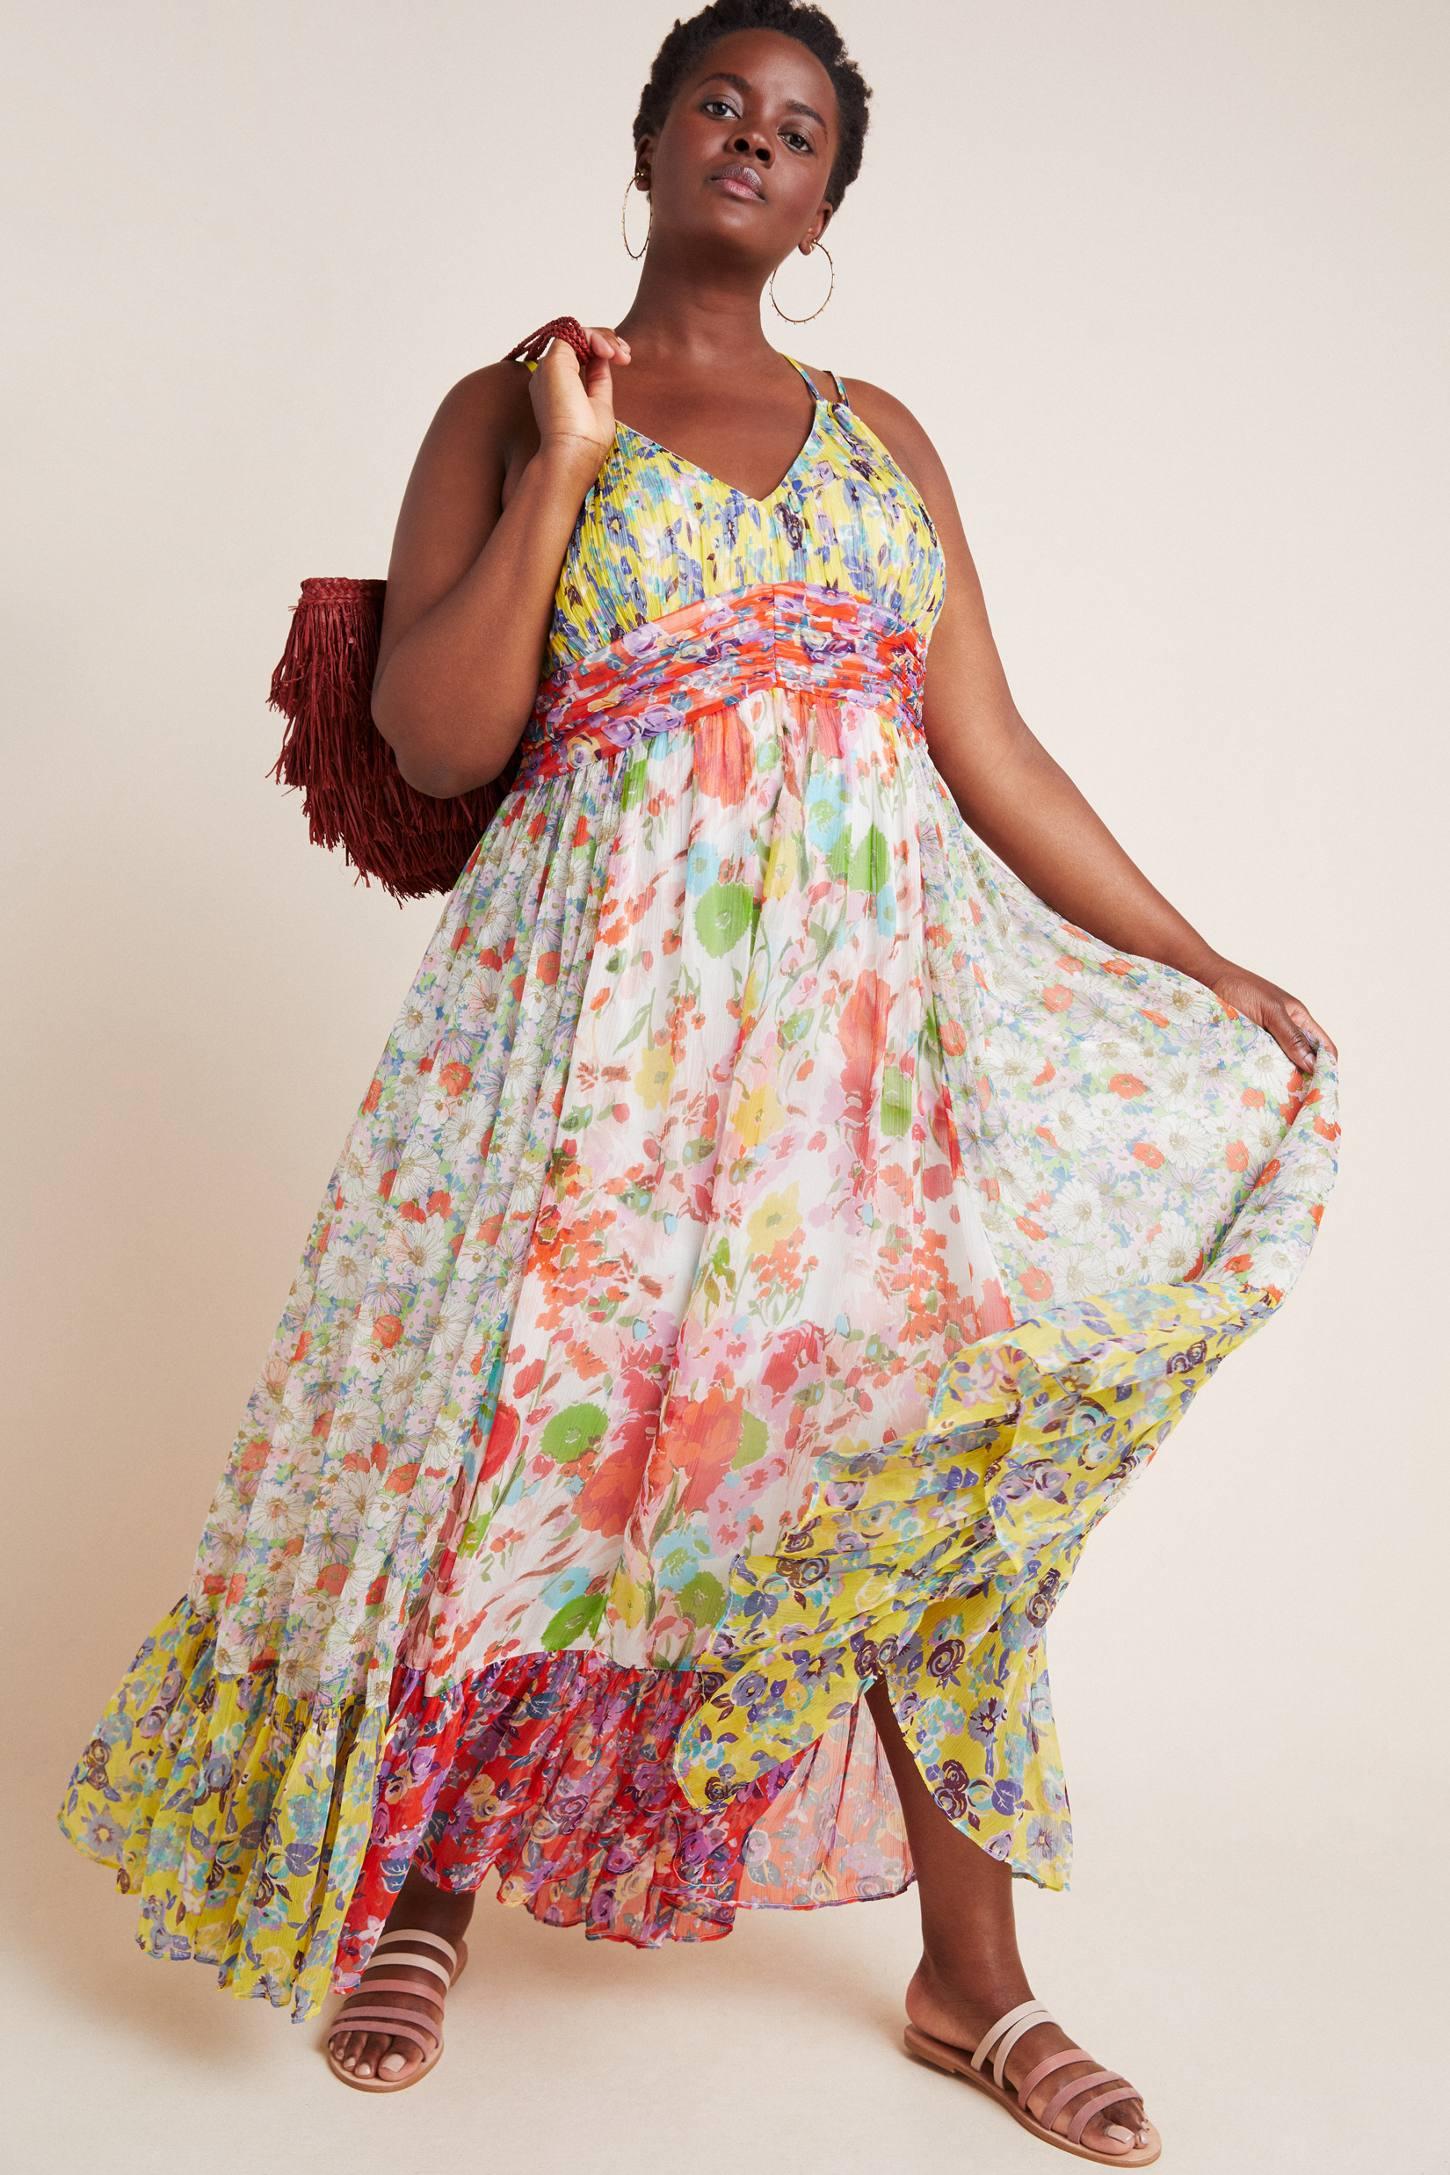 50609c5ce6ece Anthropologie New Arrivals Clothing Dresses Sale 2019